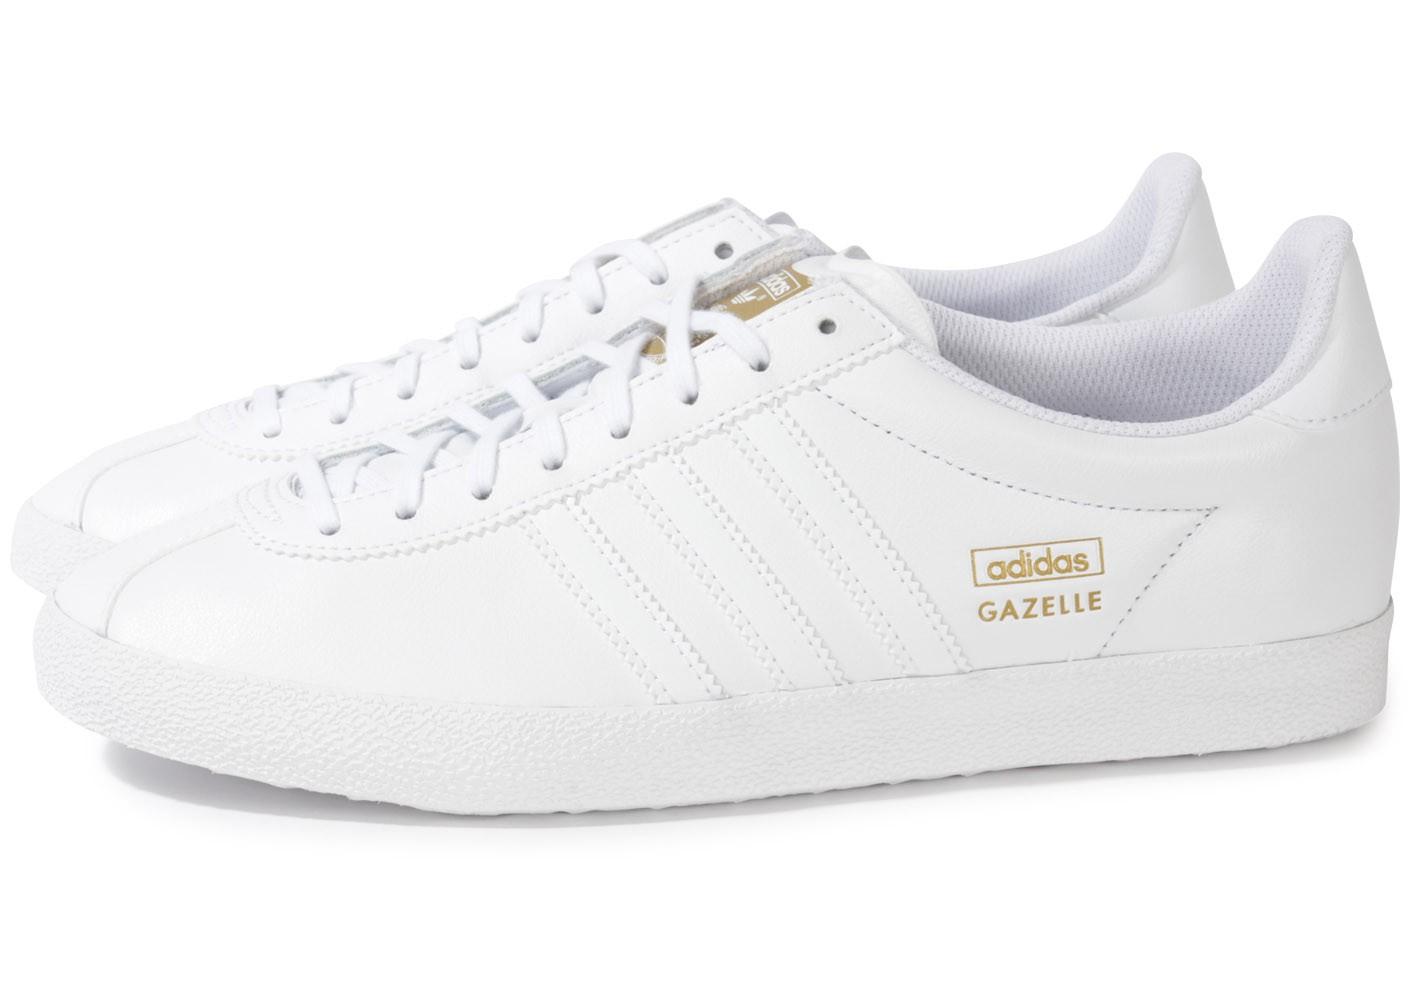 adidas gazelle blanche et rose